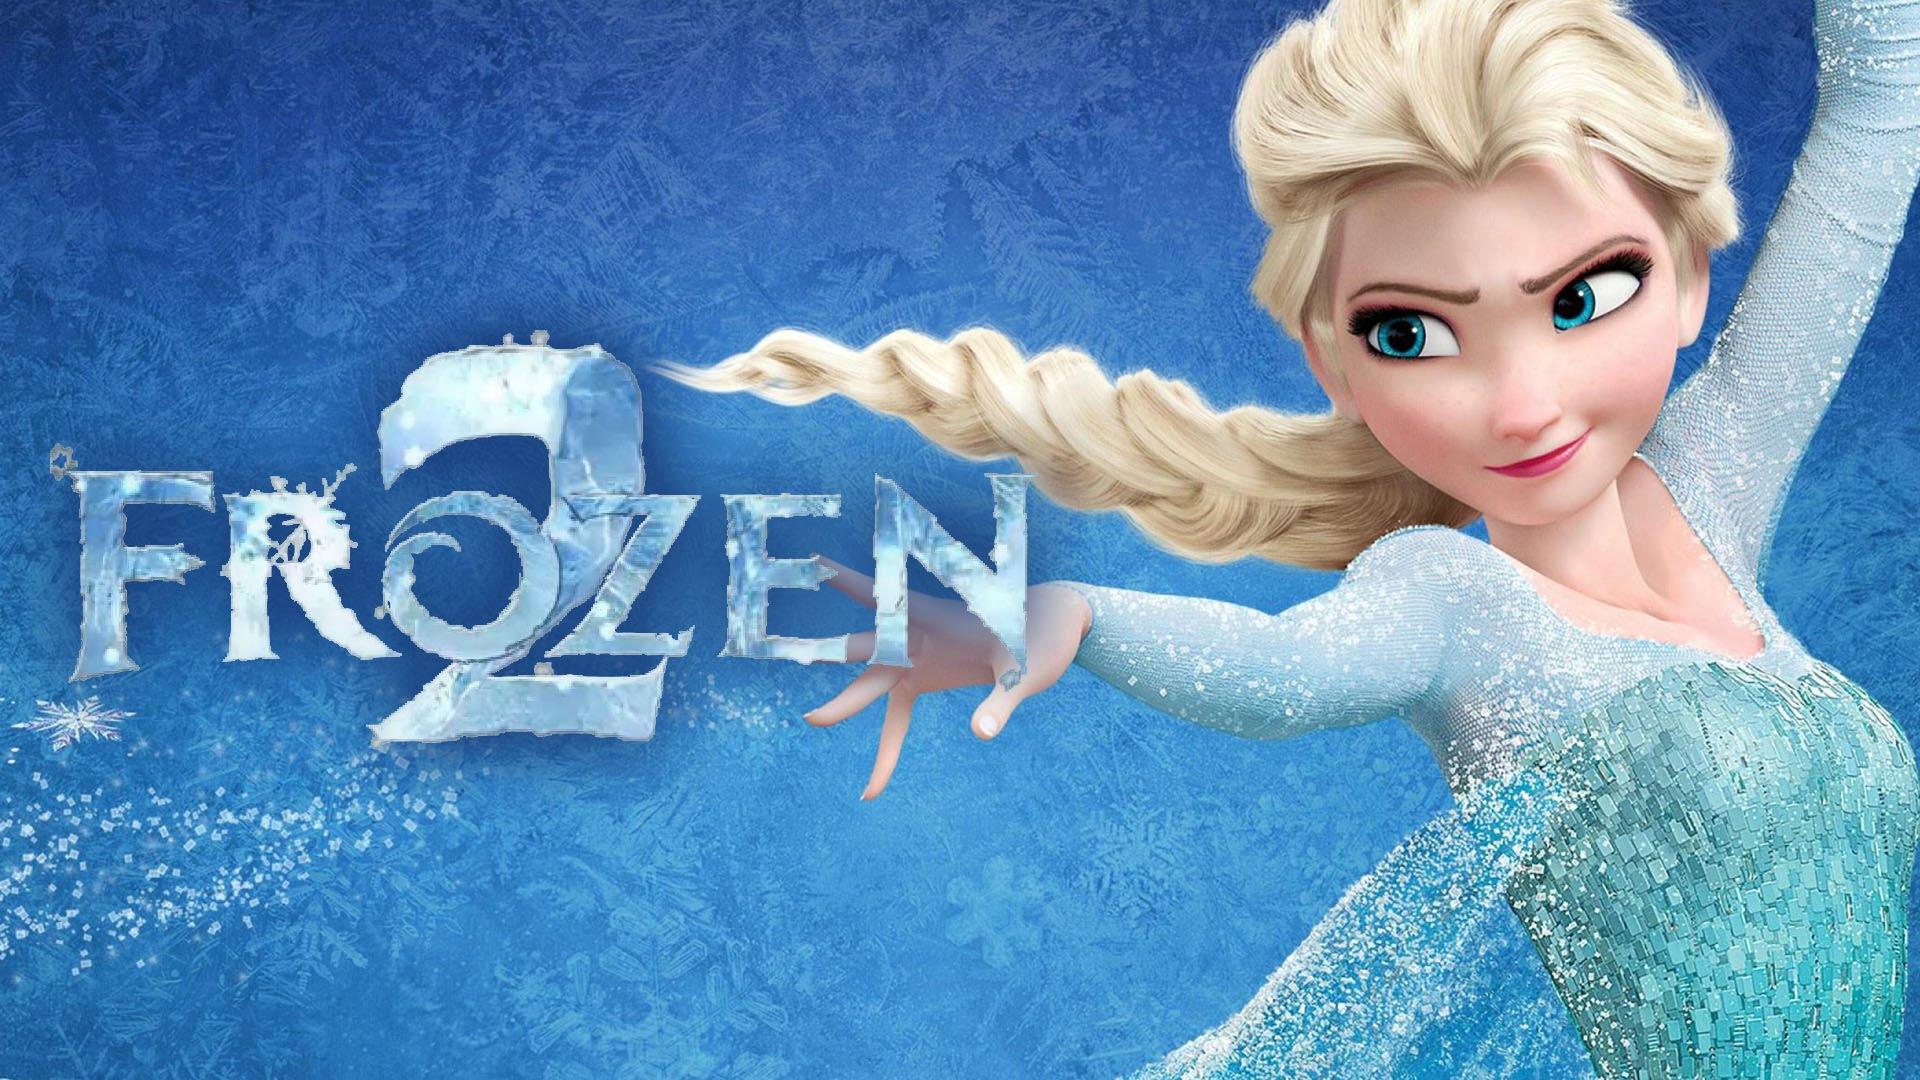 en iyi animasyon filmleri frozen